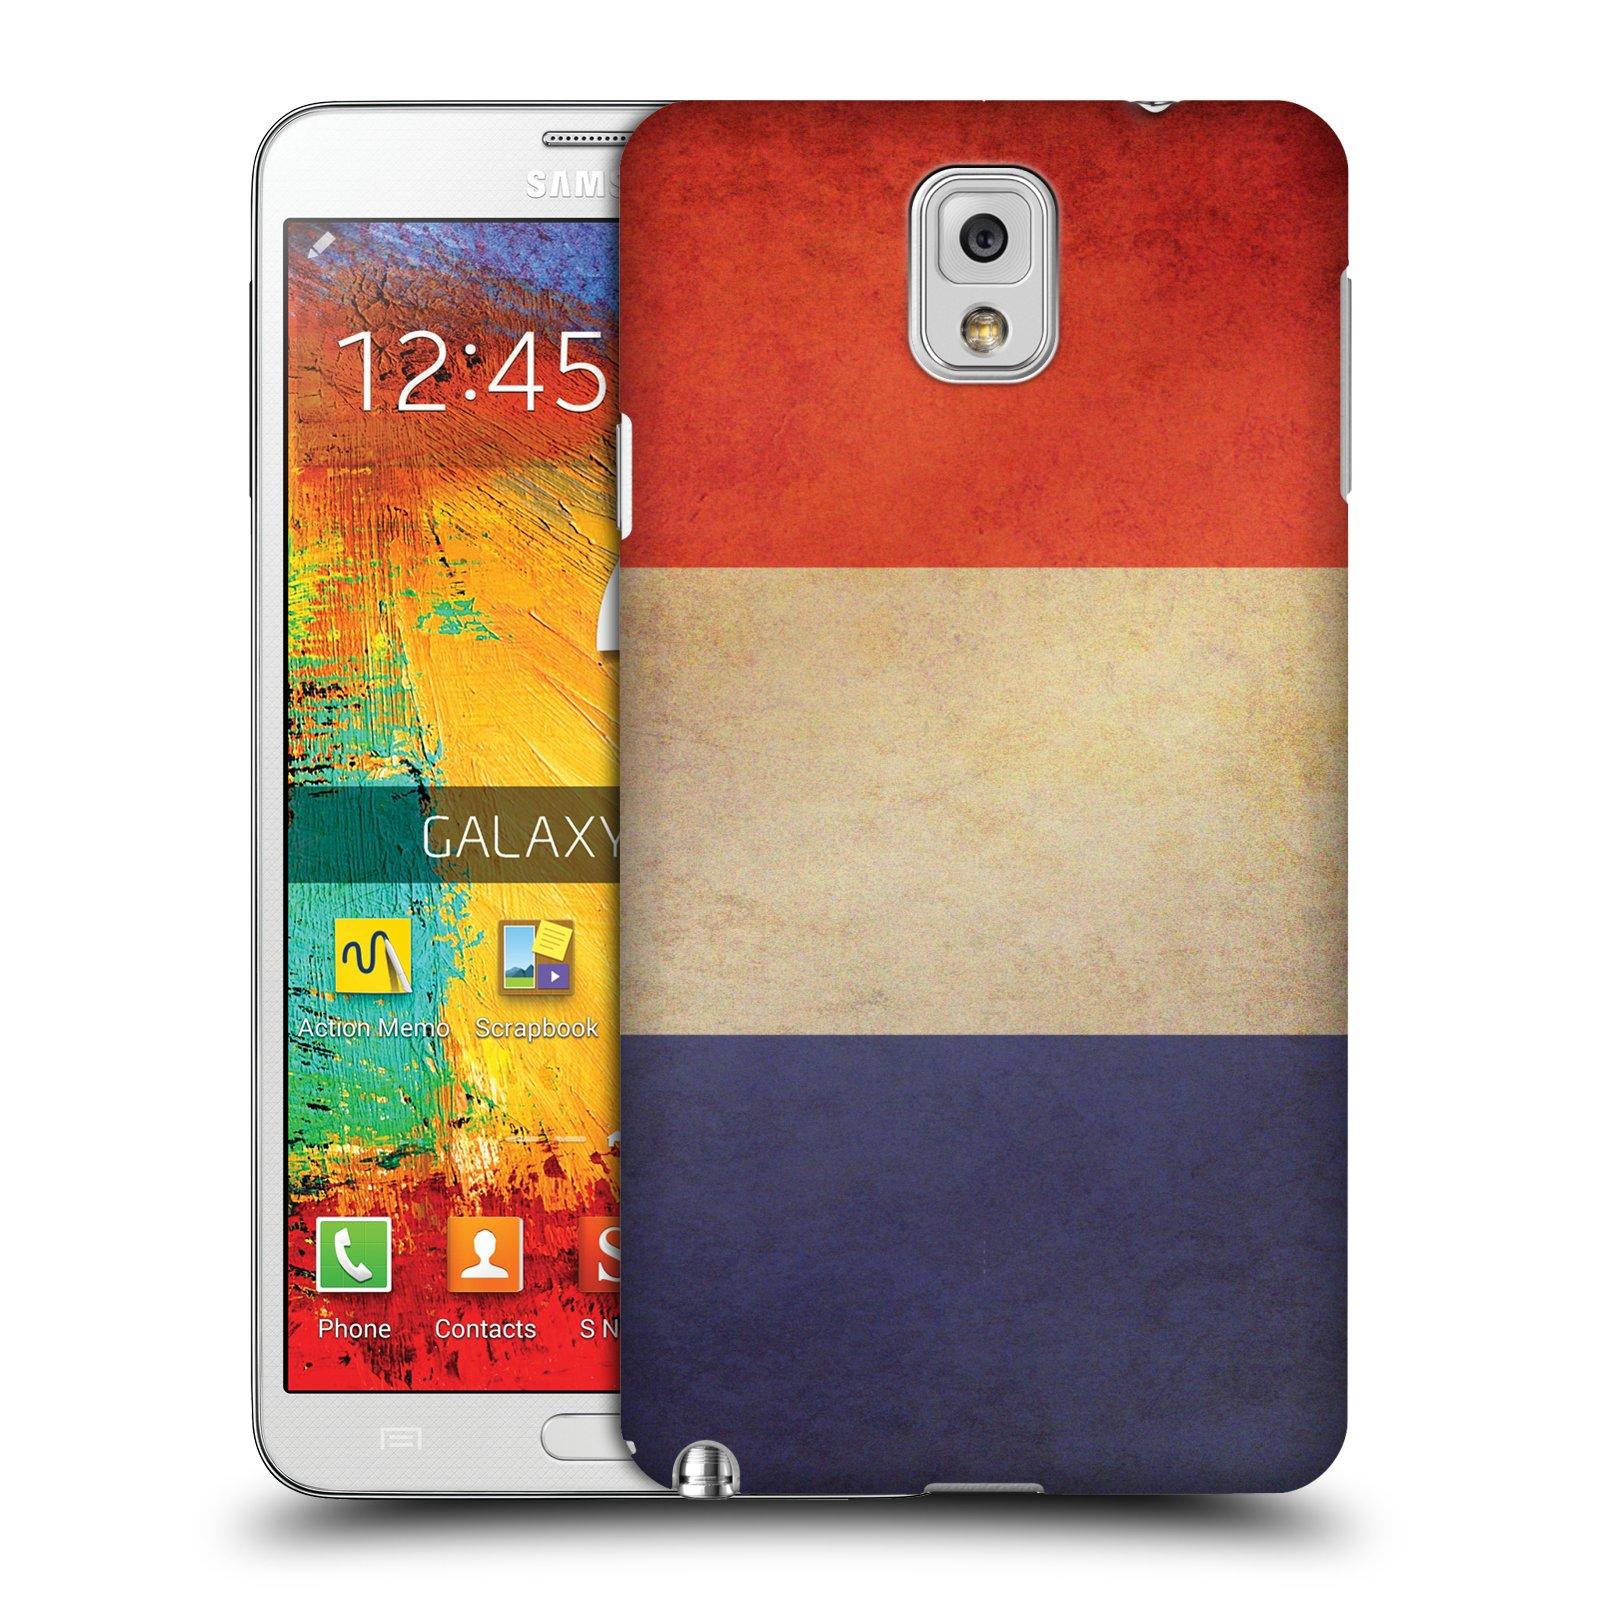 Plastové pouzdro na mobil Samsung Galaxy Note 3 HEAD CASE VLAJKA FRANCIE (Kryt či obal na mobilní telefon Samsung Galaxy Note 3 SM-N9005)